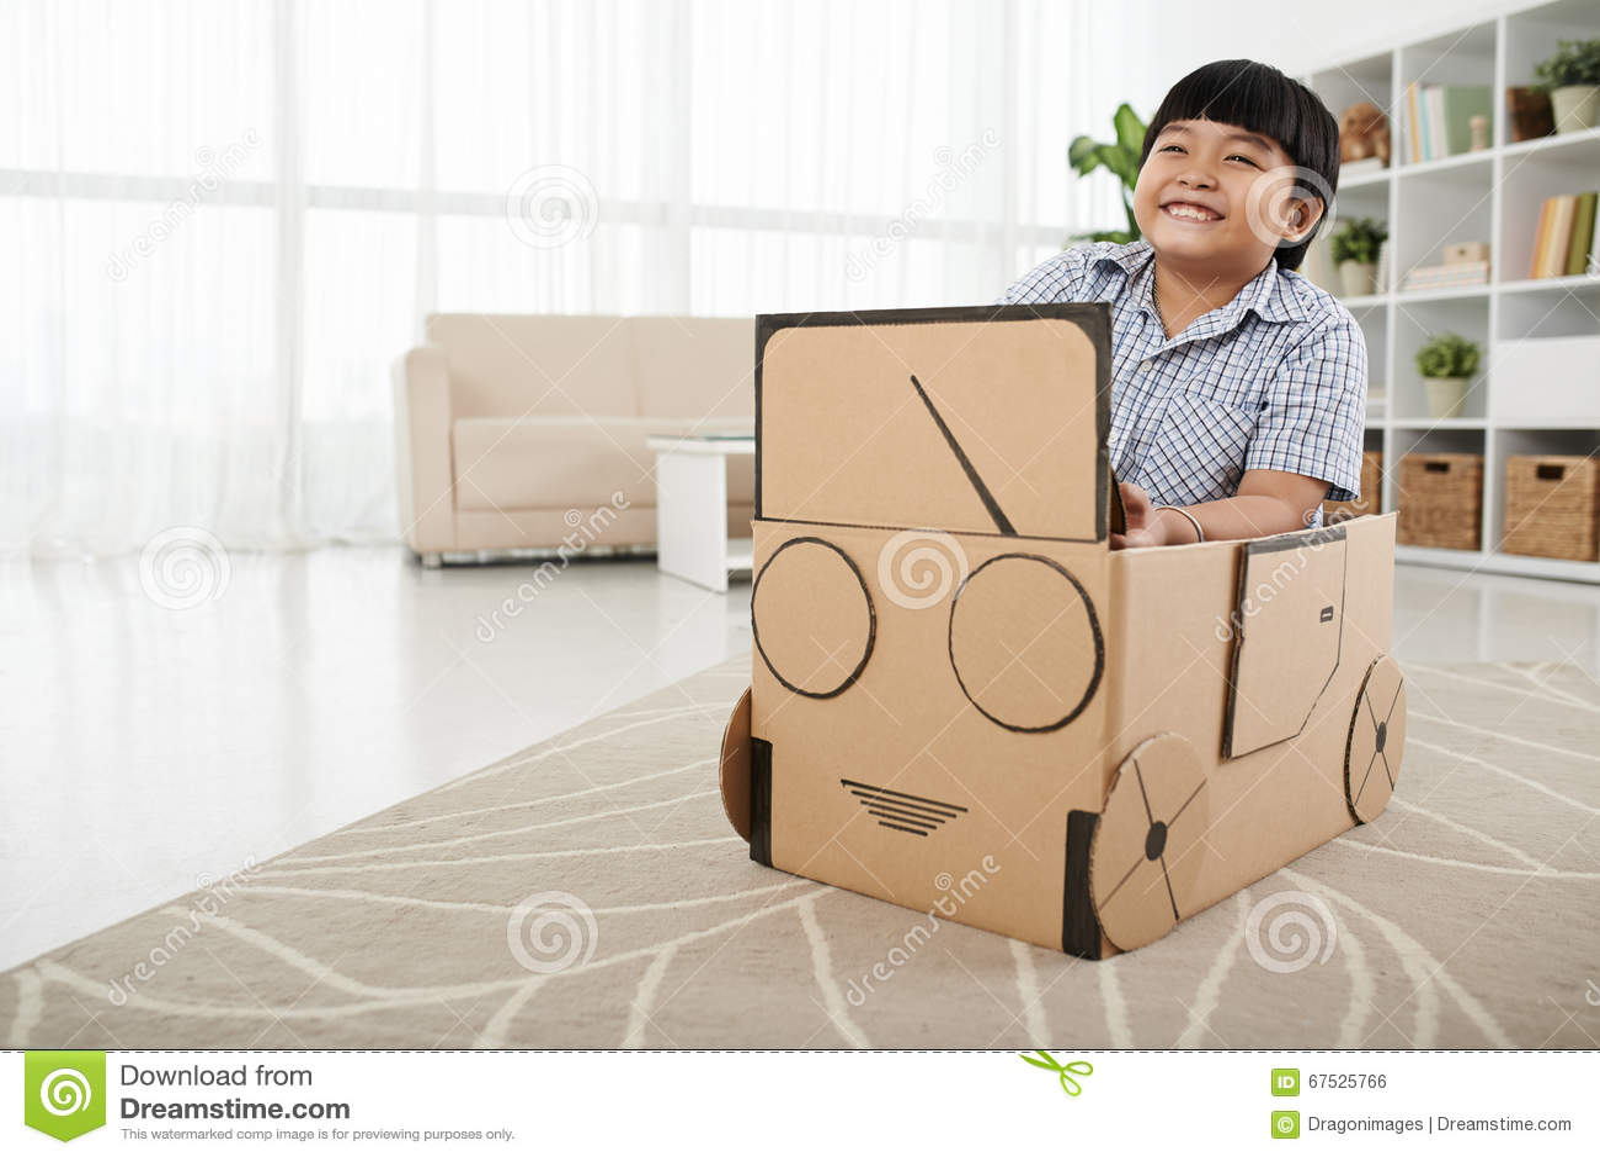 how to make a vehicle box